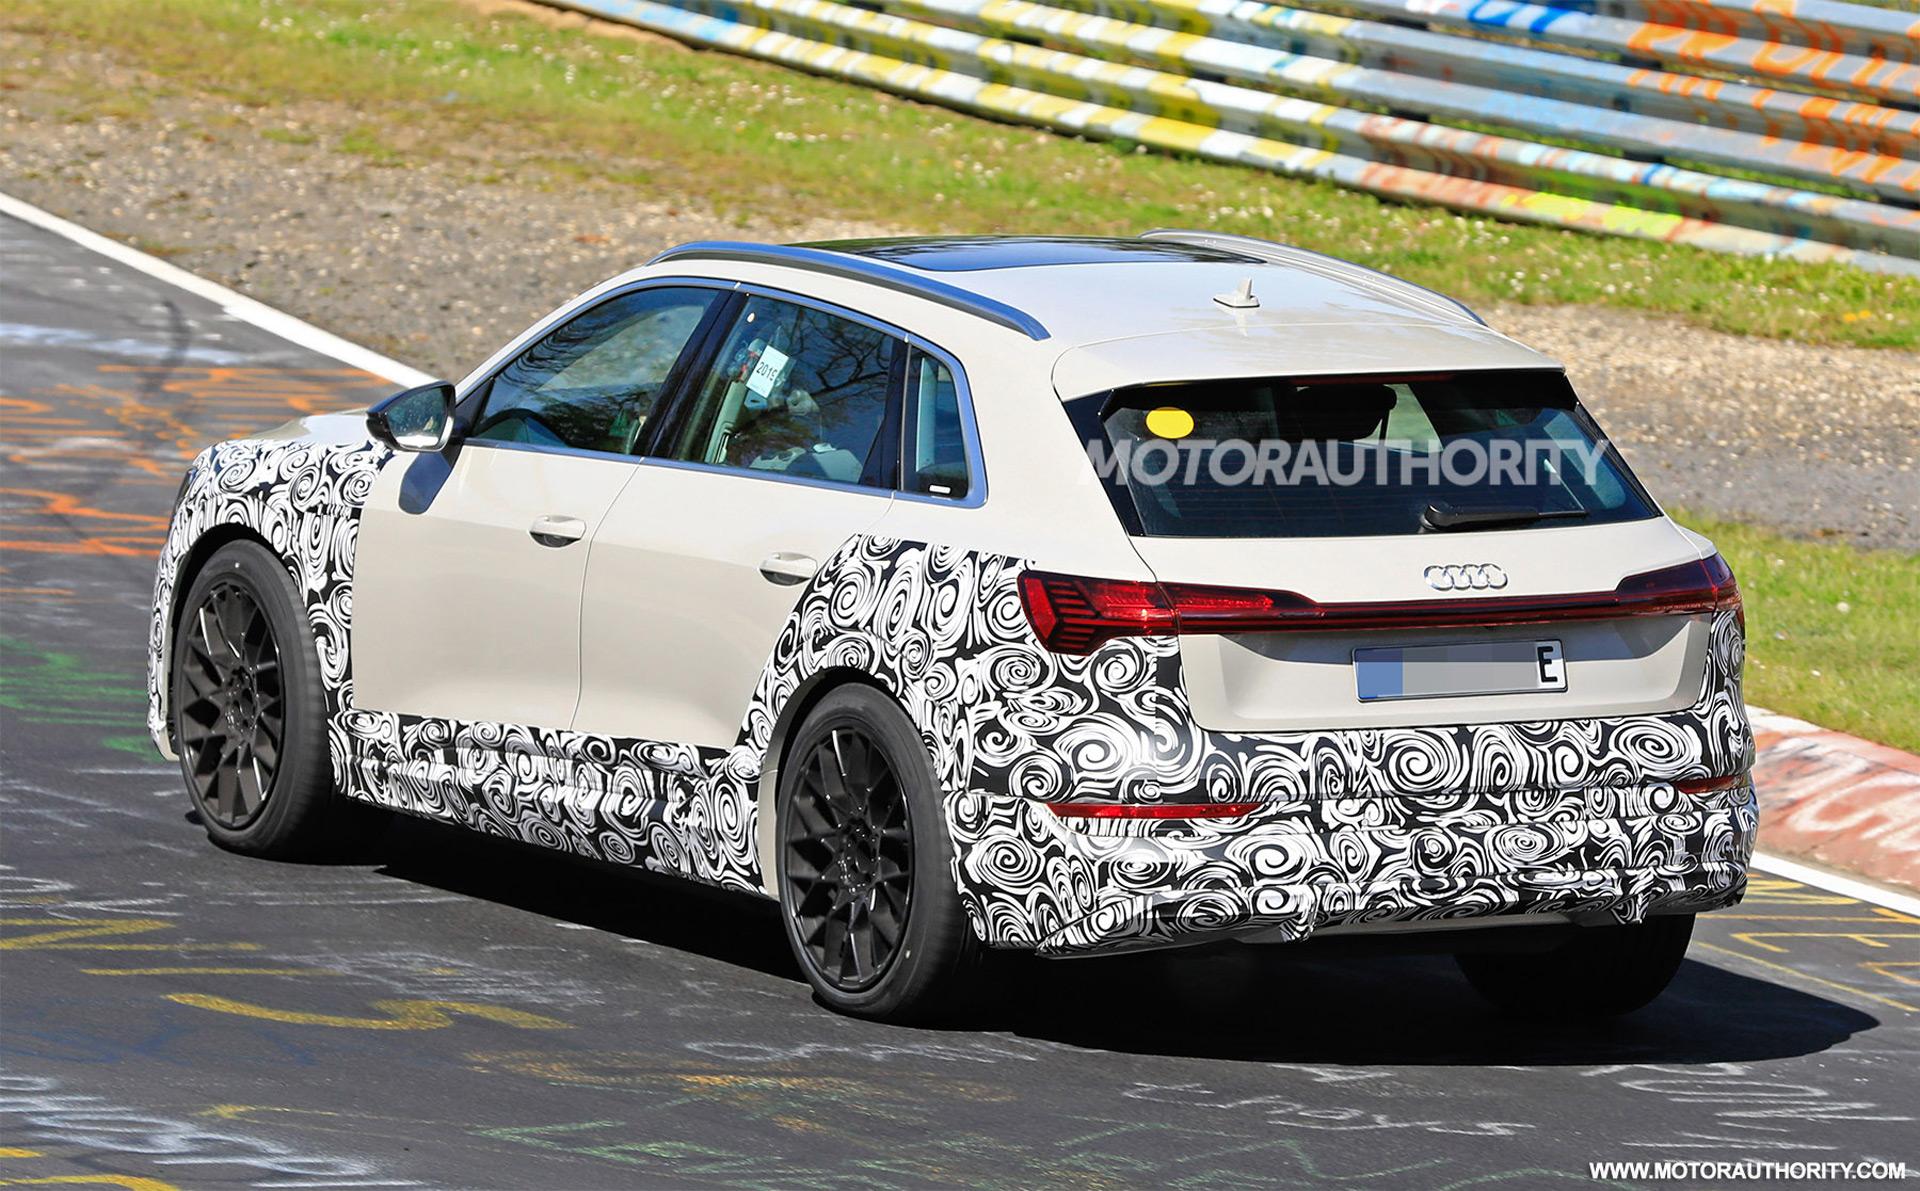 2018 [Audi] E-Tron Quattro - Page 7 2020-audi-e-tron-s-spy-shots--image-via-s-baldauf-sb-medien_100702345_h